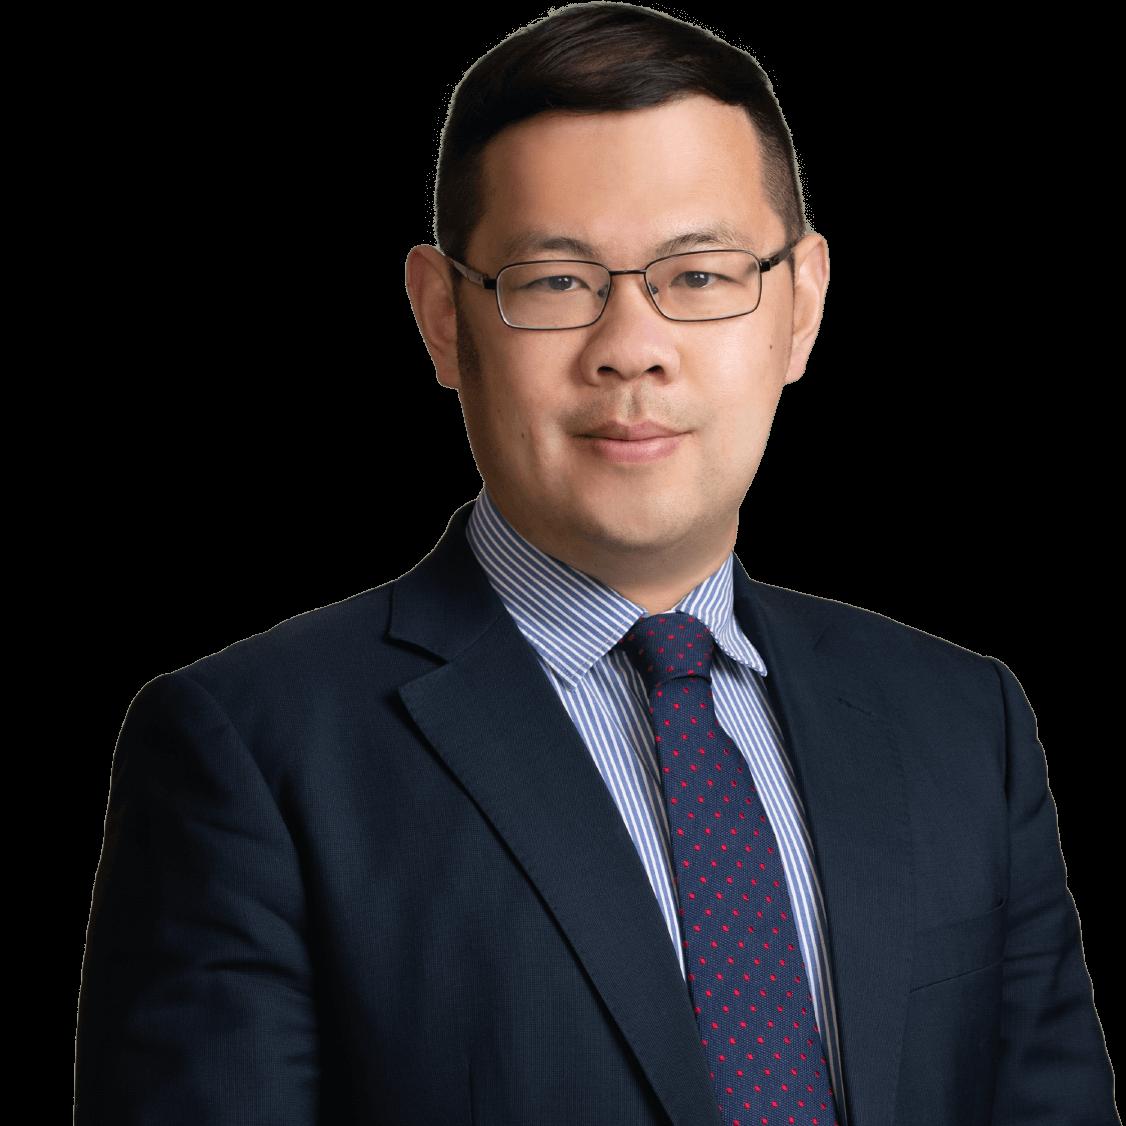 Lijie Han